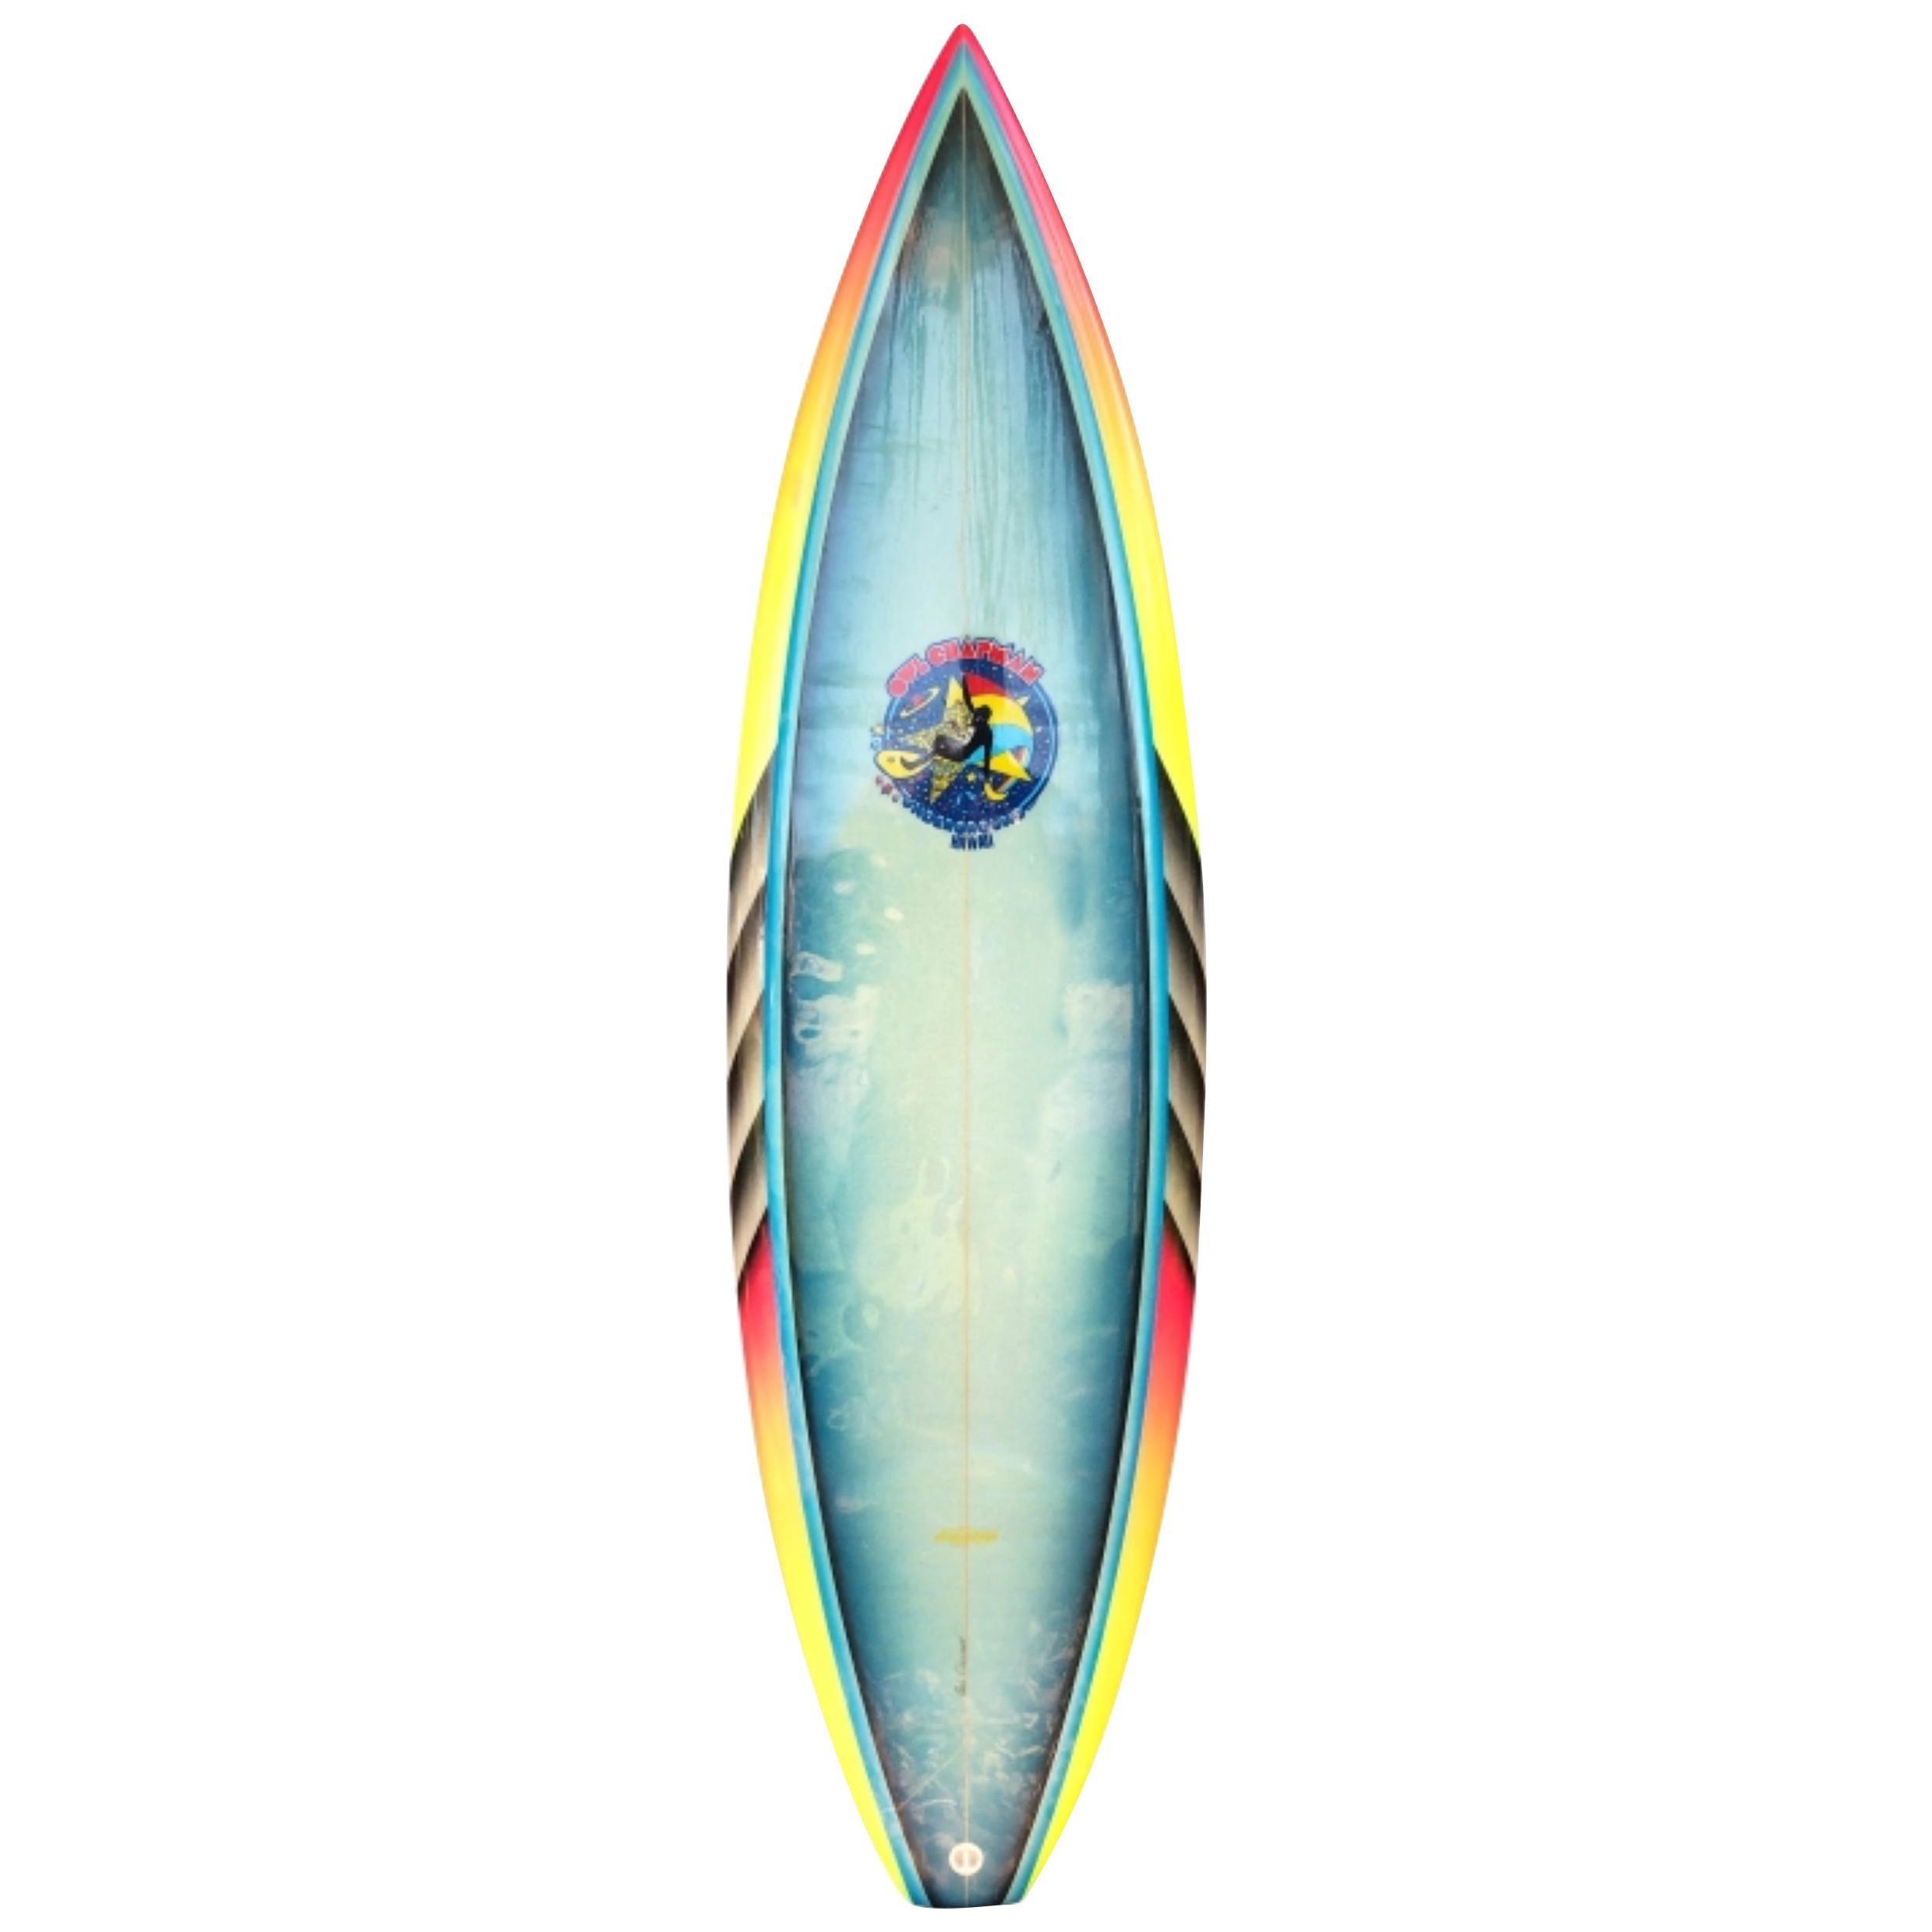 1980s Vintage Owl Chapman Underground Hawaii Surfboard